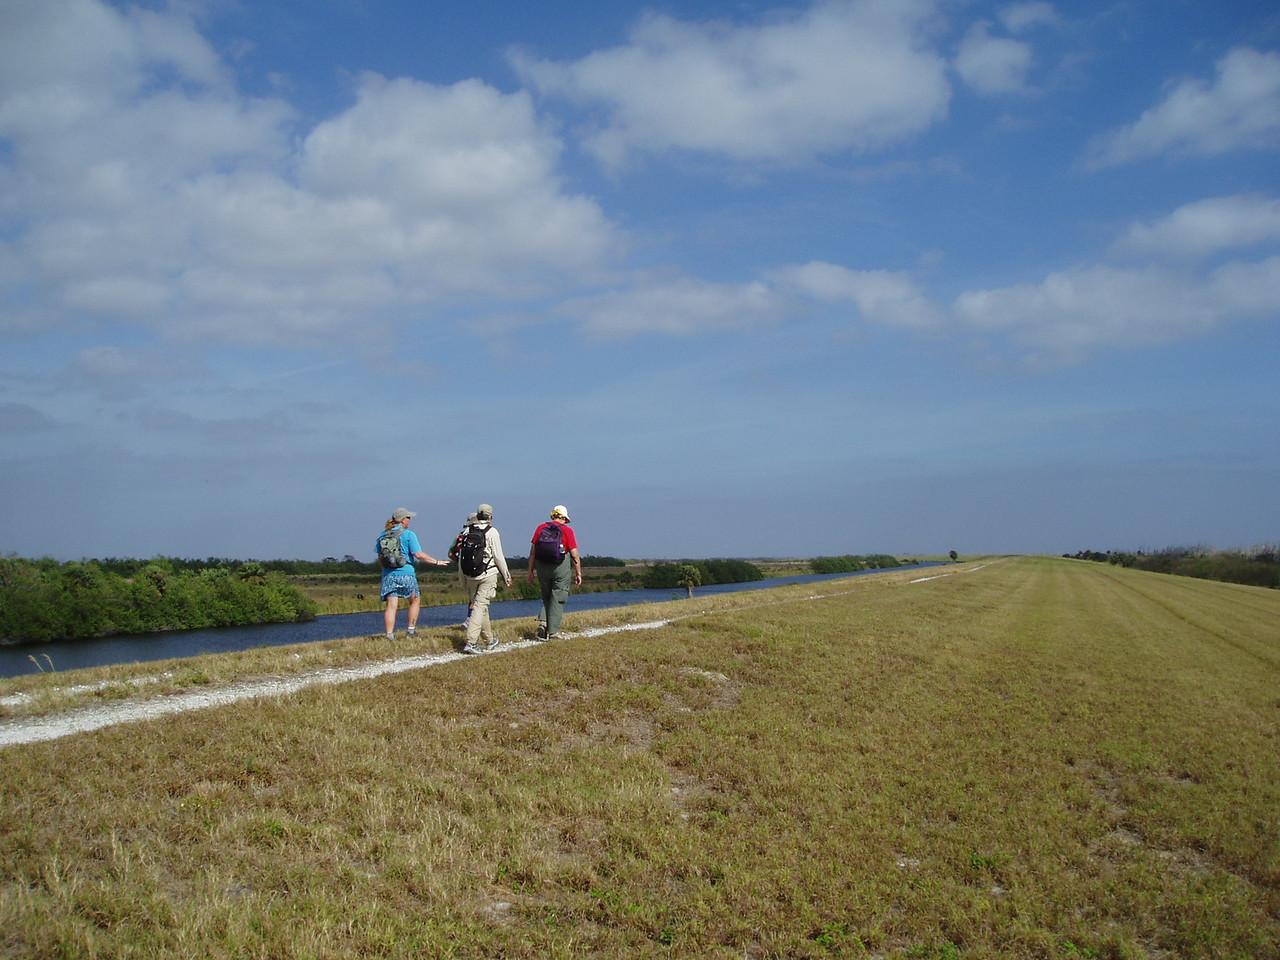 Hikers on the Herbert Hoover Dike<br /> PHOTO CREDIT: Robert Coveney / Florida Trail Association